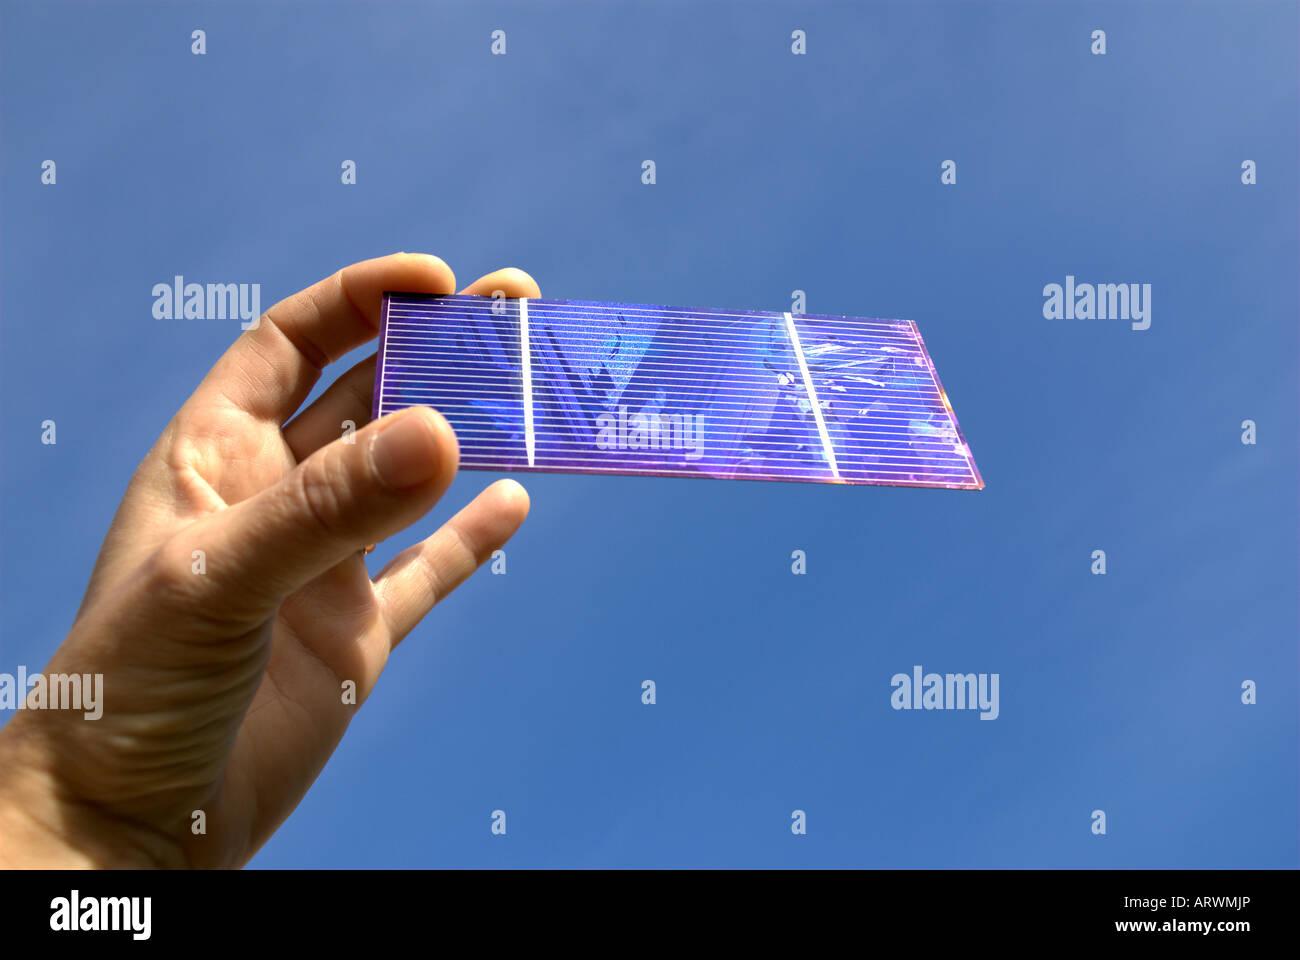 Sola celda solar Imagen De Stock